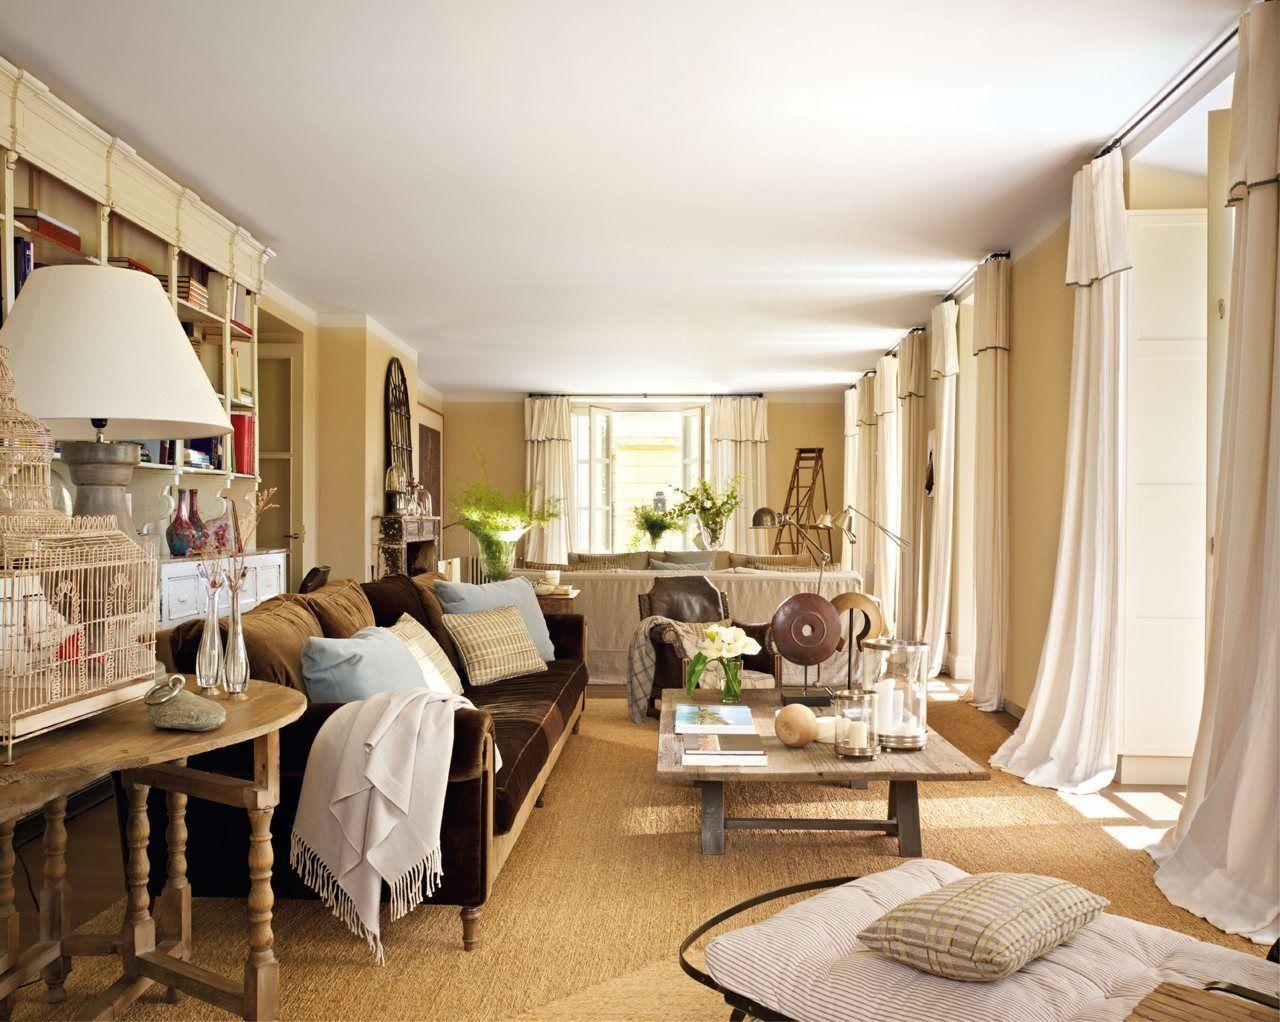 Renaissance Villas Apartment Homes In Las Vegas Las Vegas